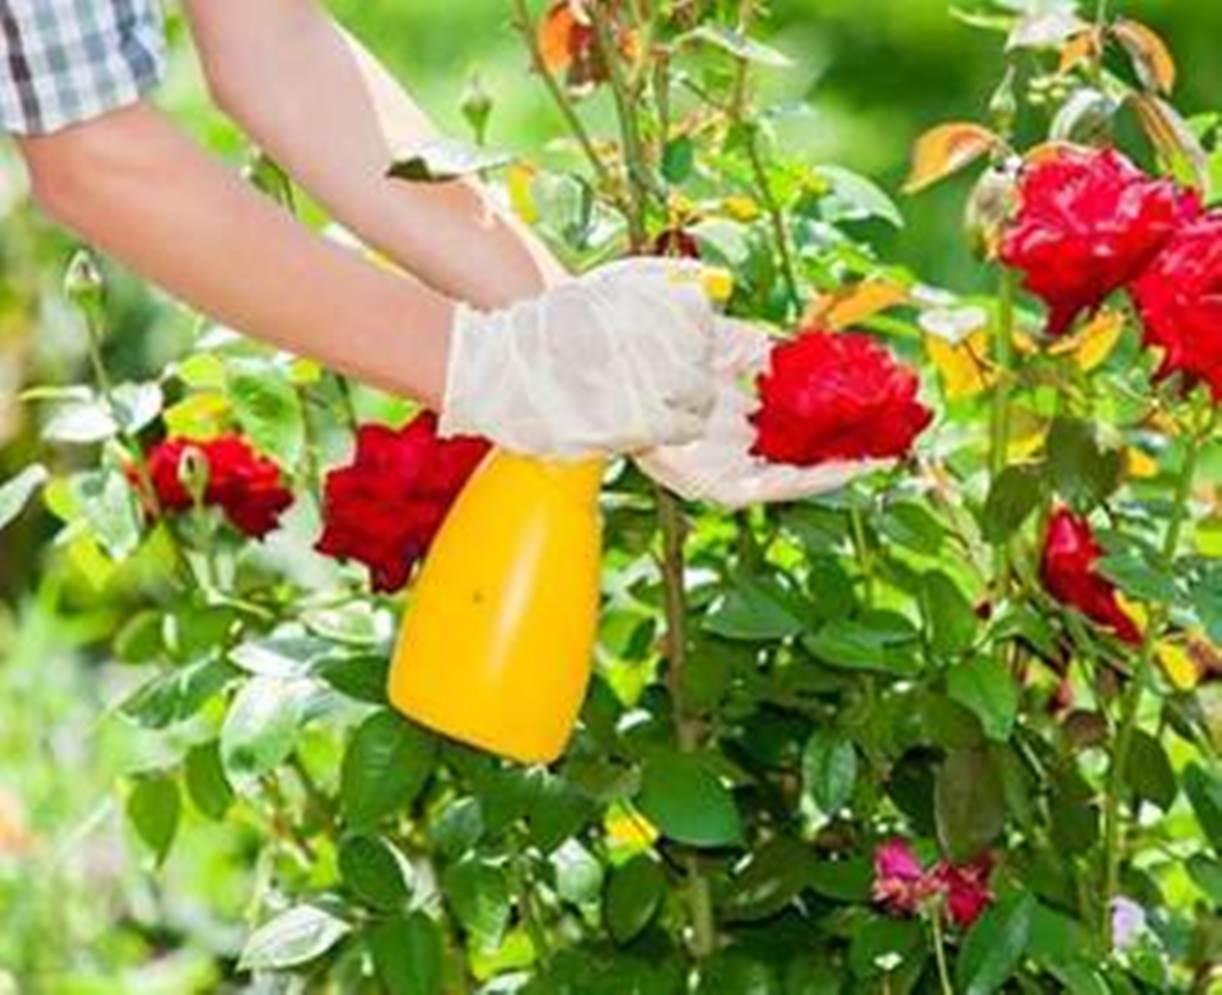 10 Cara Merawat Bunga Mawar Agar Berbunga Lebat Diedit Com